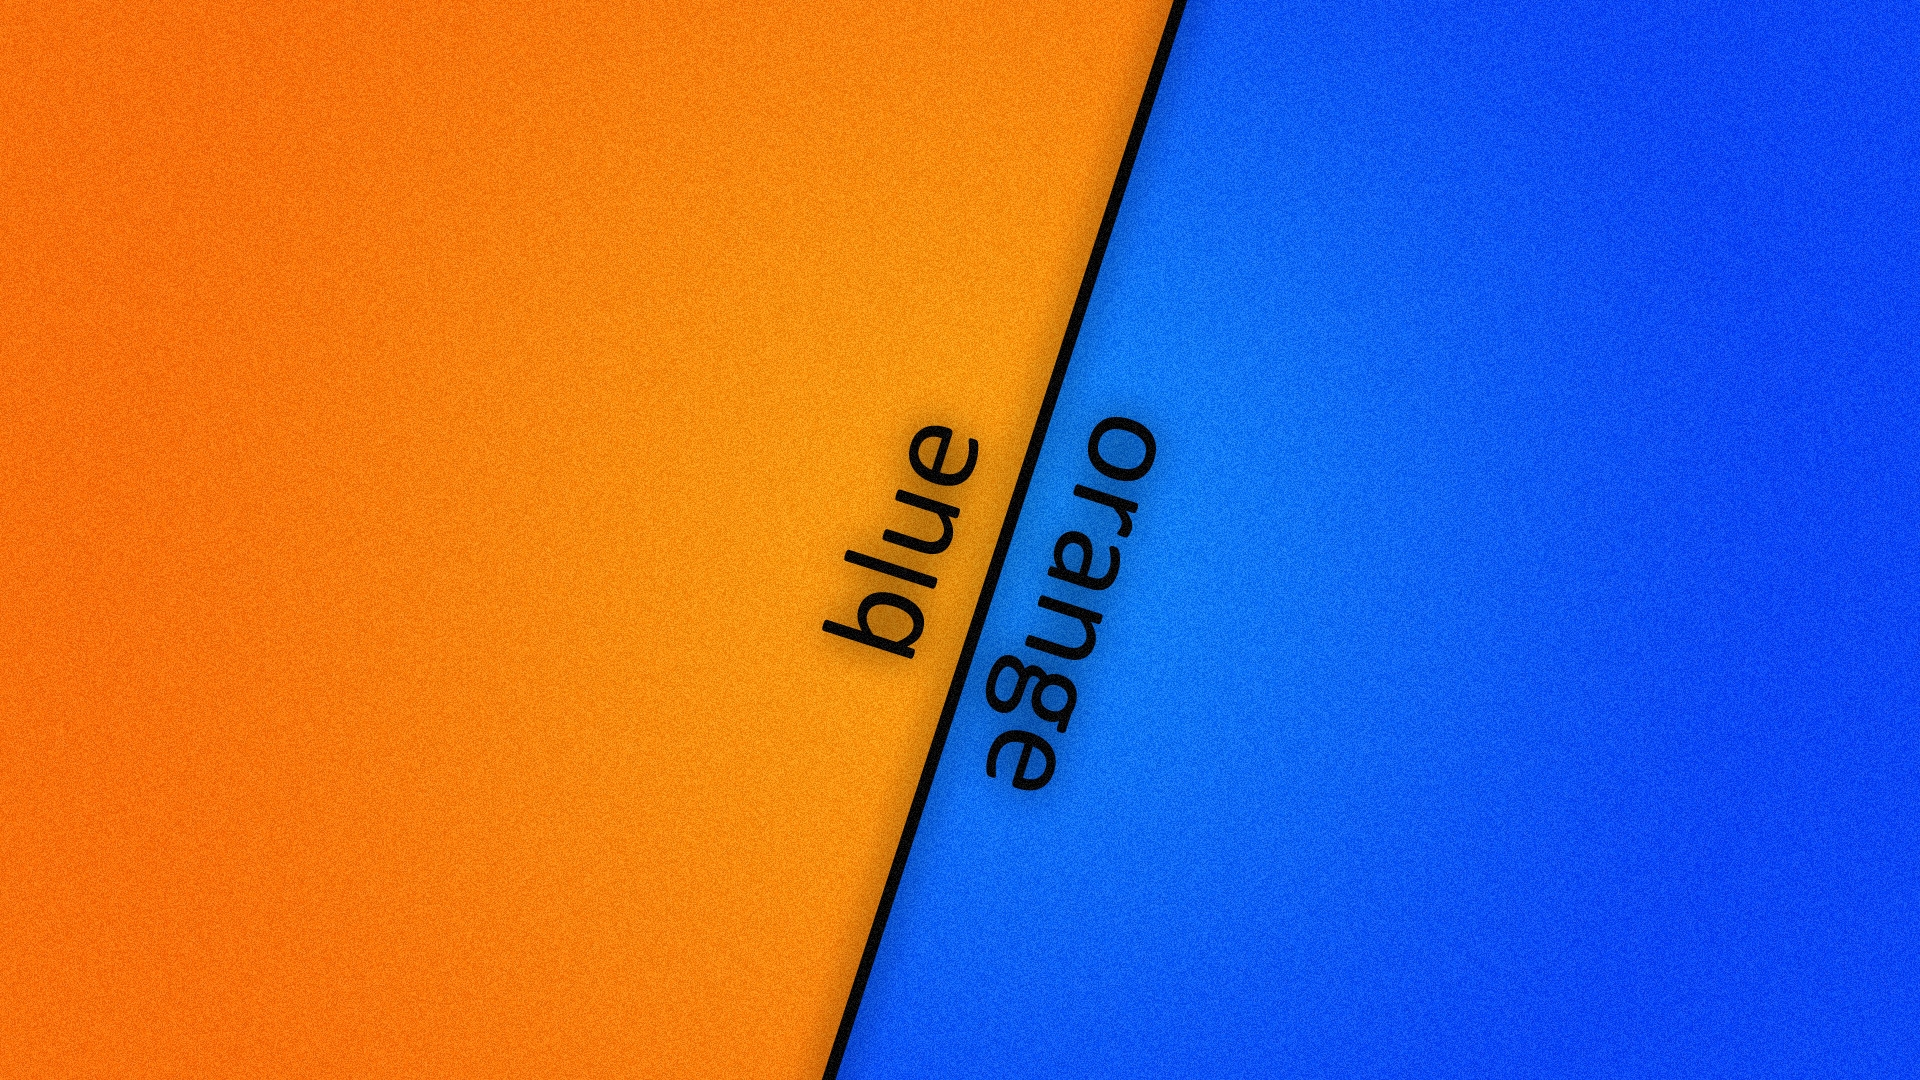 надпись, blue, orange